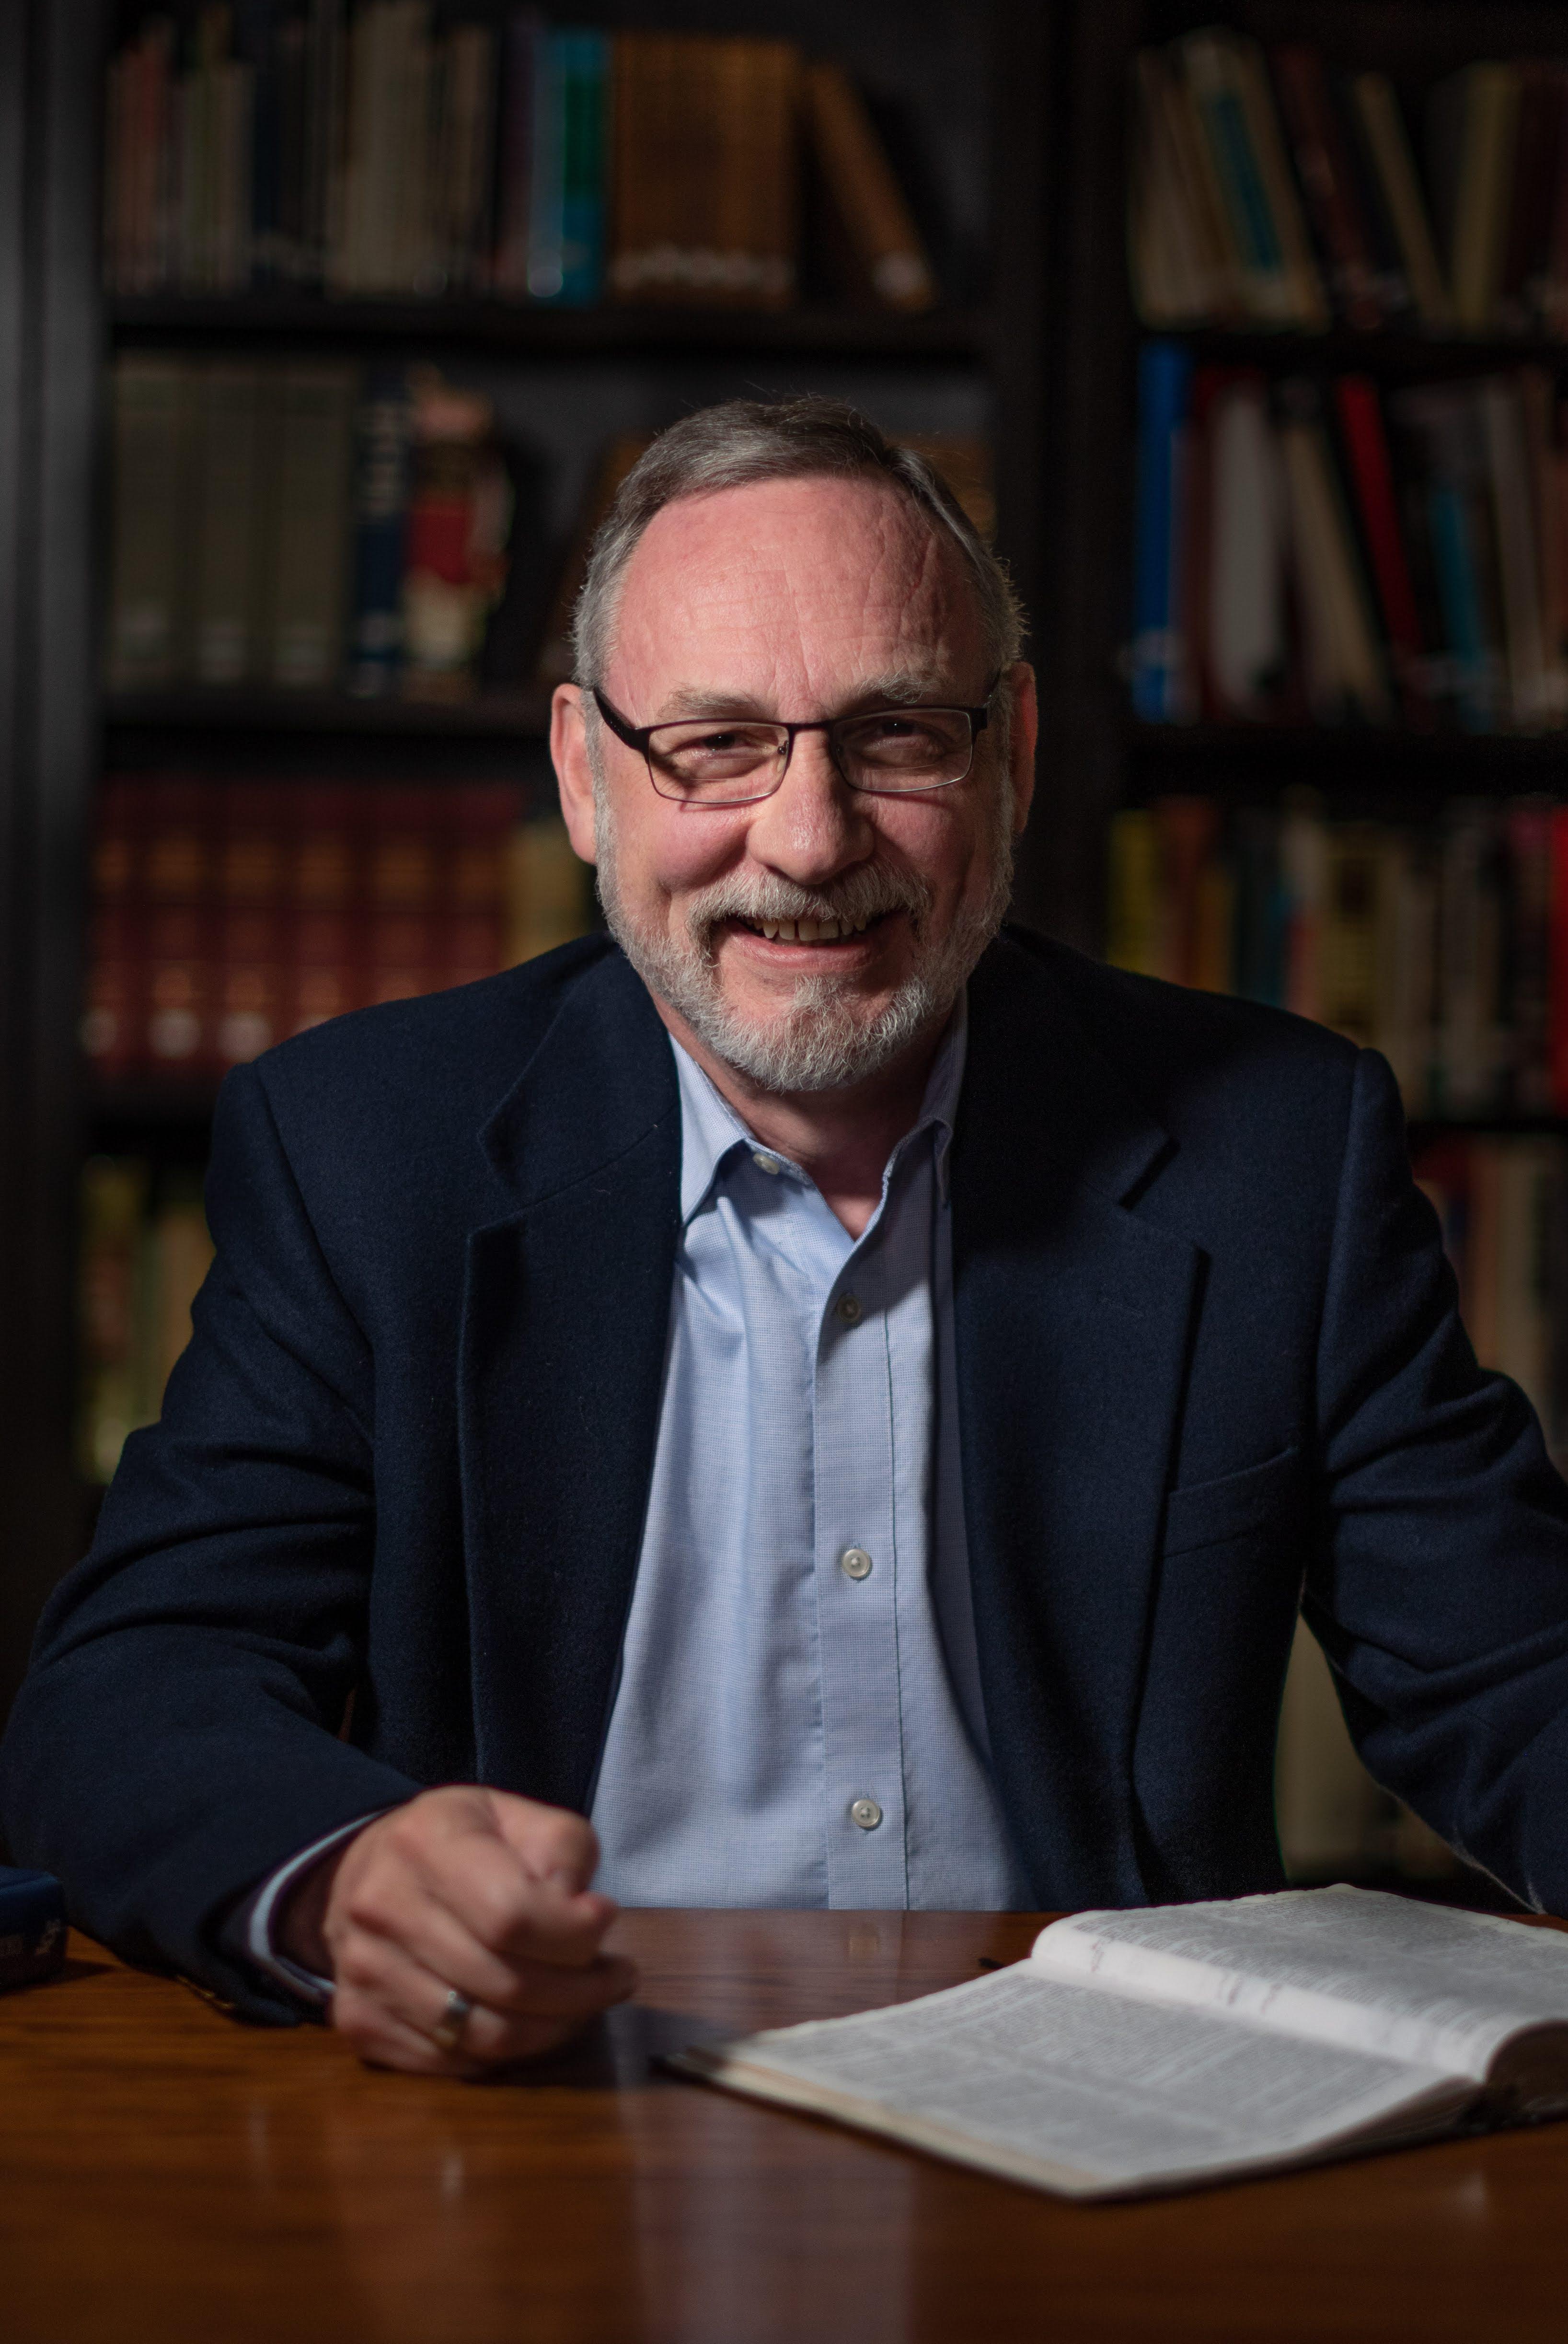 Dr. Kayser smiling theologically